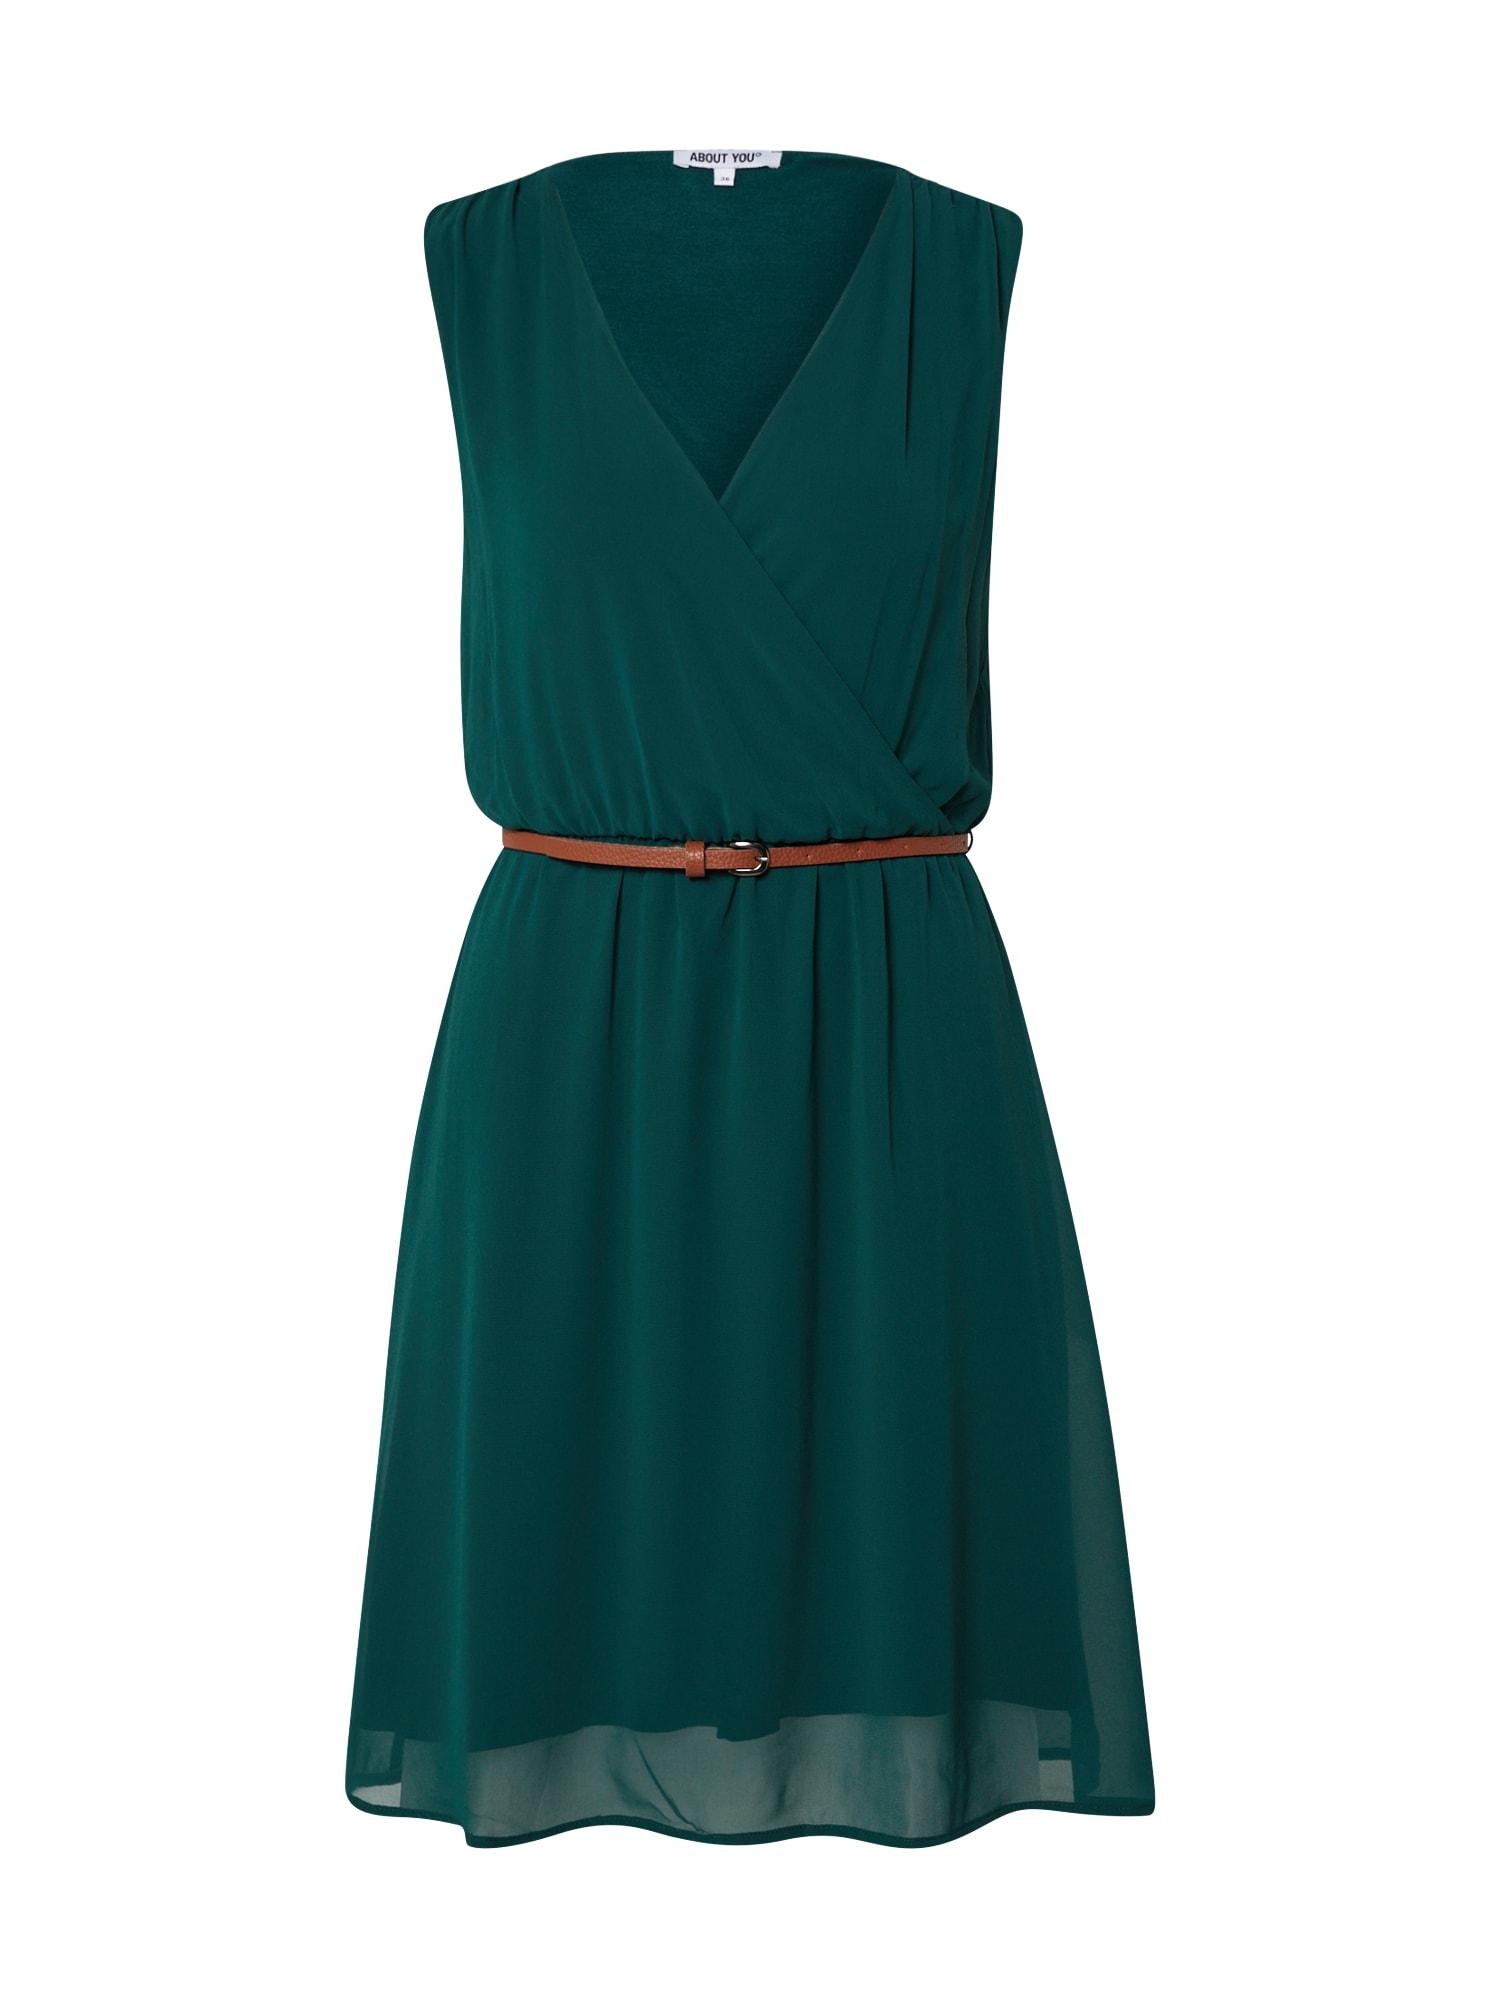 ABOUT YOU Suknelė 'Lilian' tamsiai žalia